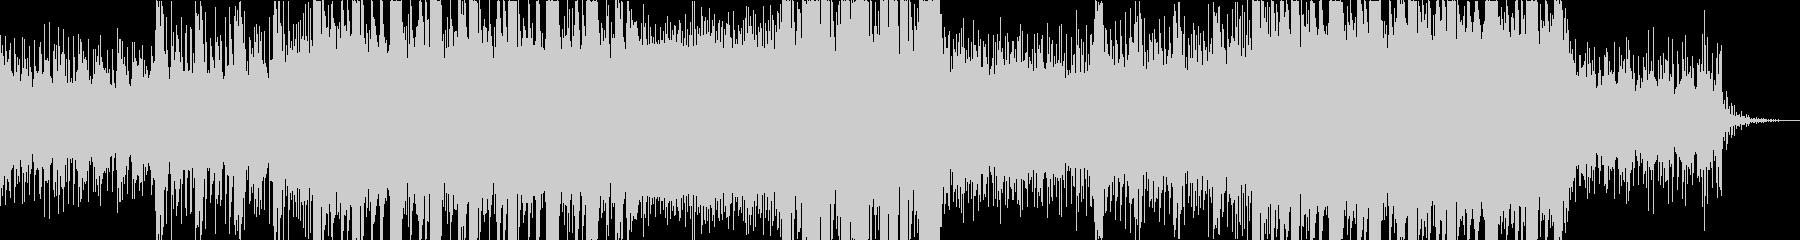 Apocalypse / Dubstepの未再生の波形